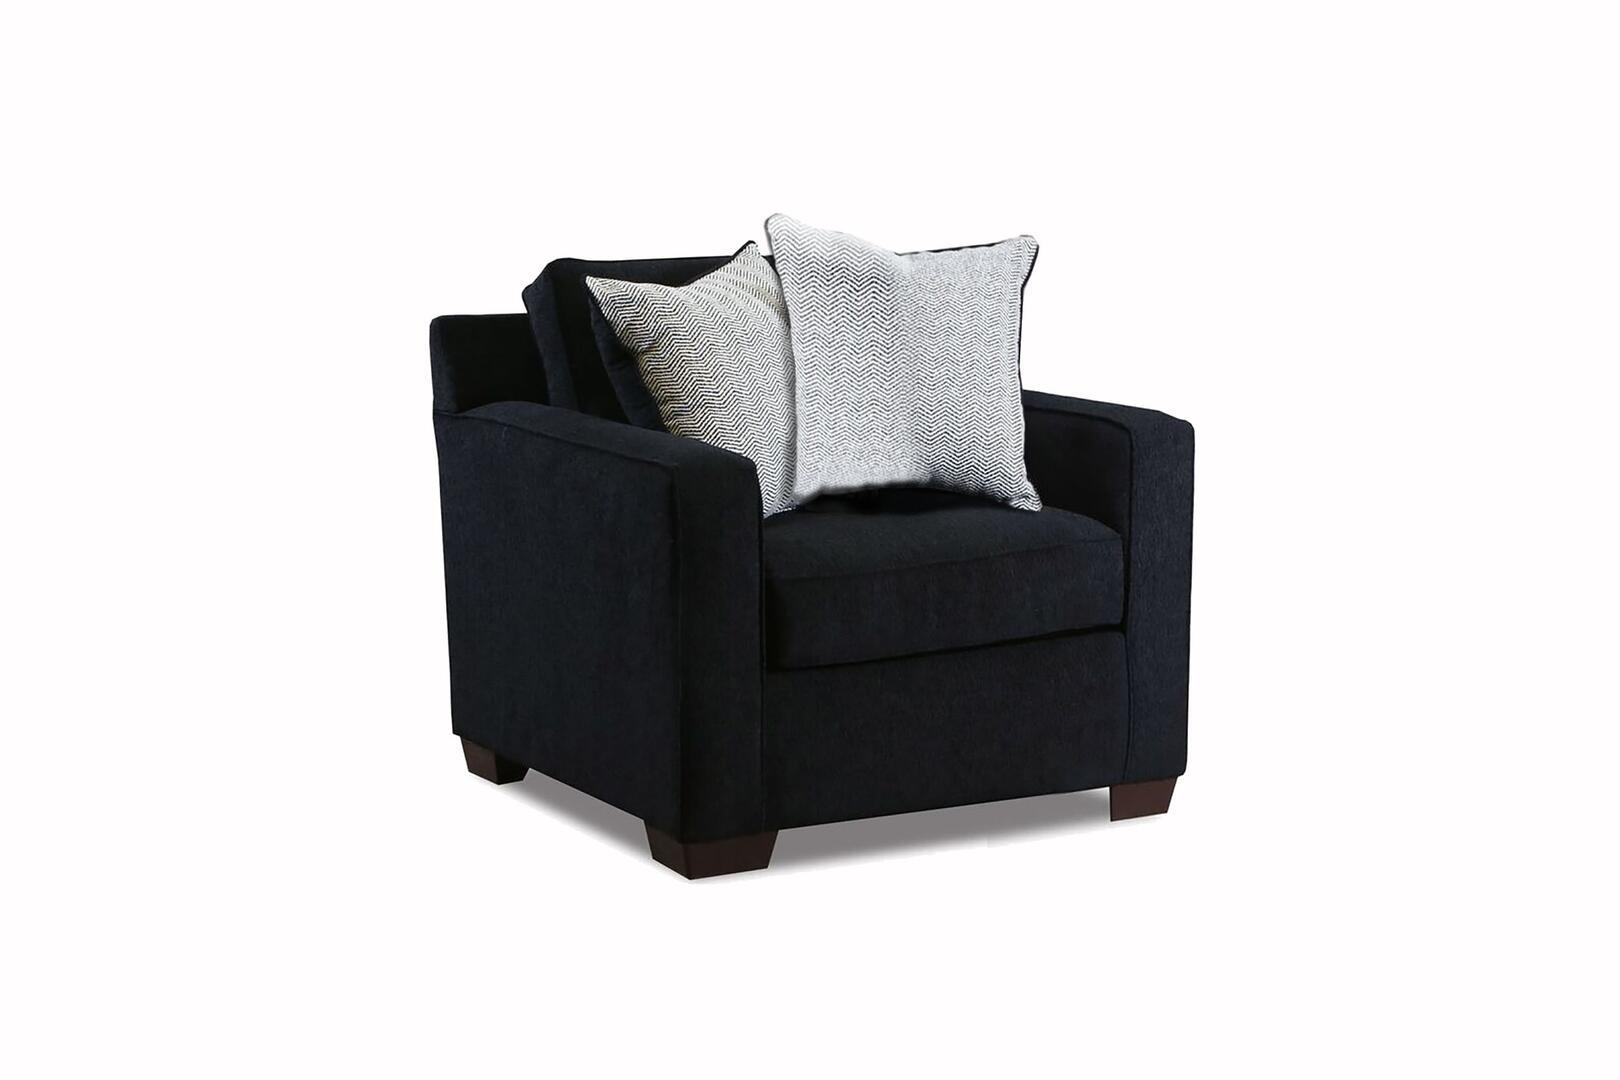 Superb Chelsea Home Furniture 1840515105Cge Machost Co Dining Chair Design Ideas Machostcouk